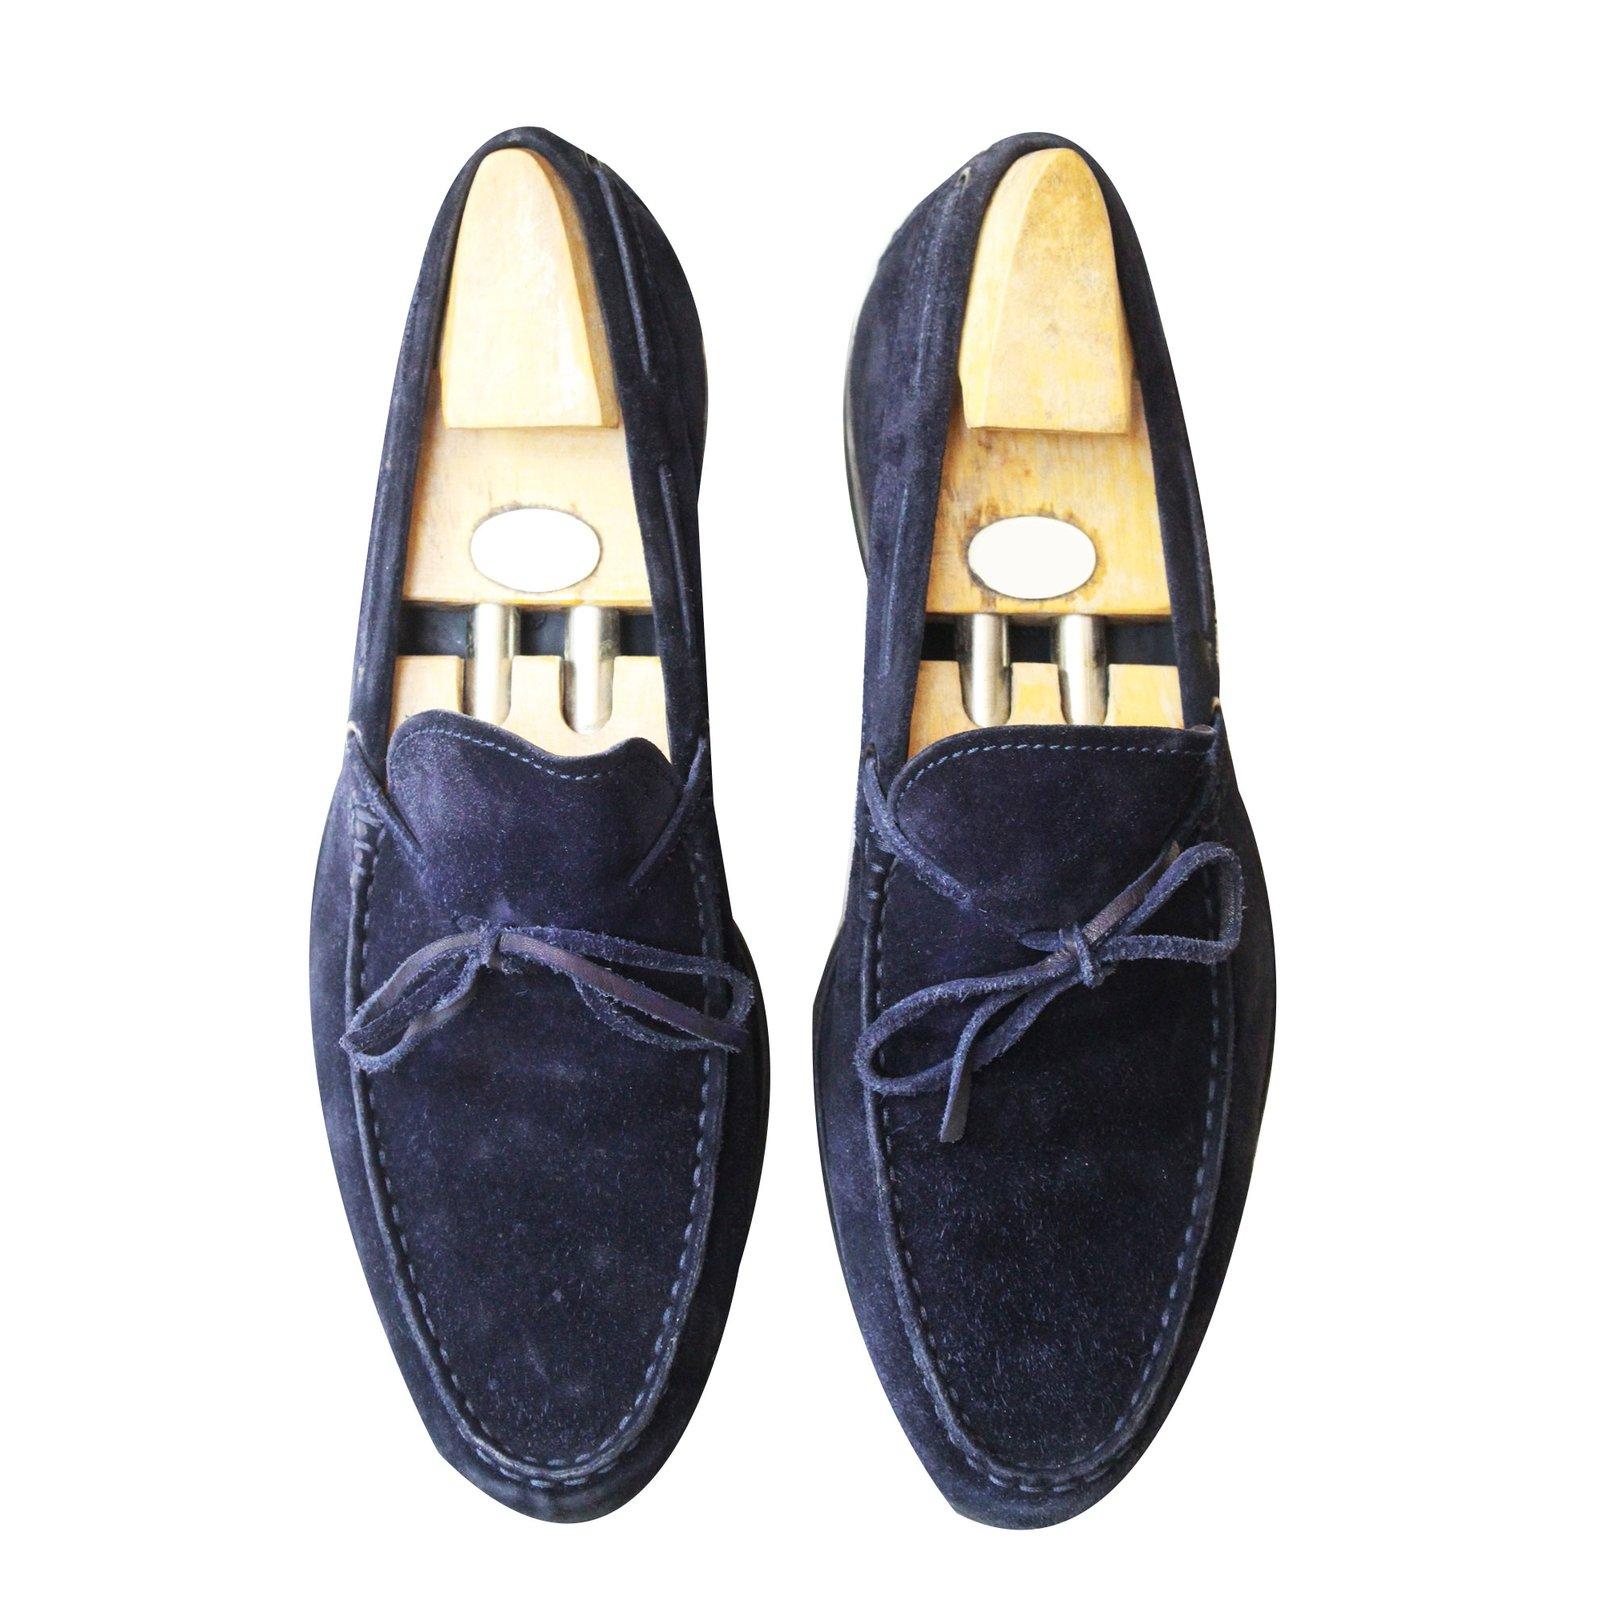 38eebb735ae Tod s Loafers Slip ons Loafers Slip ons Suede Navy blue ref.53635 ...